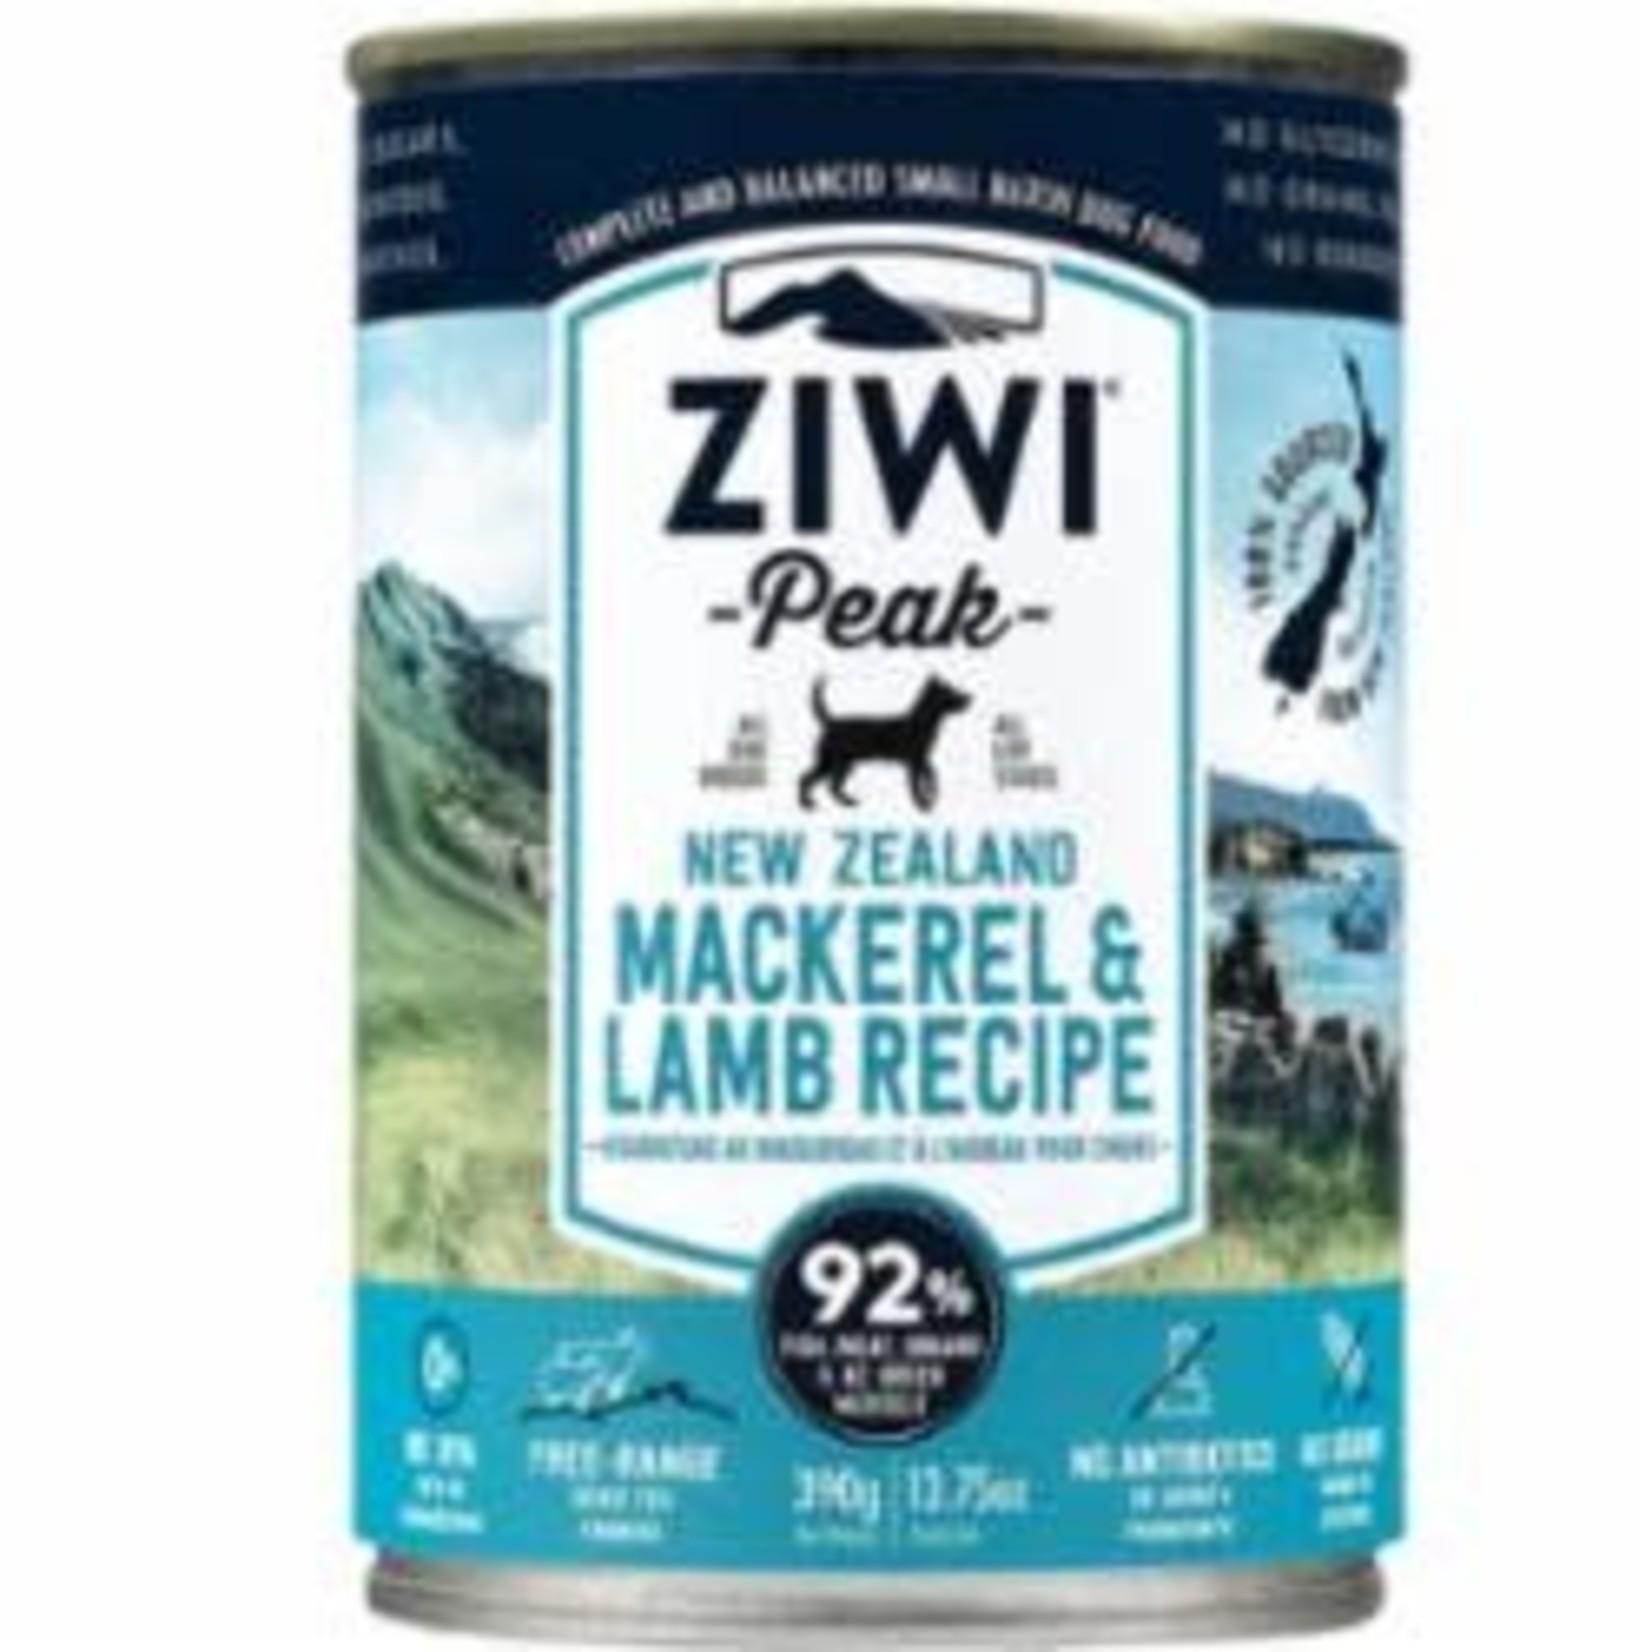 Ziwi Peak Ziwi Dog Grain Free Mackerel & Lamb 13.75 OZ